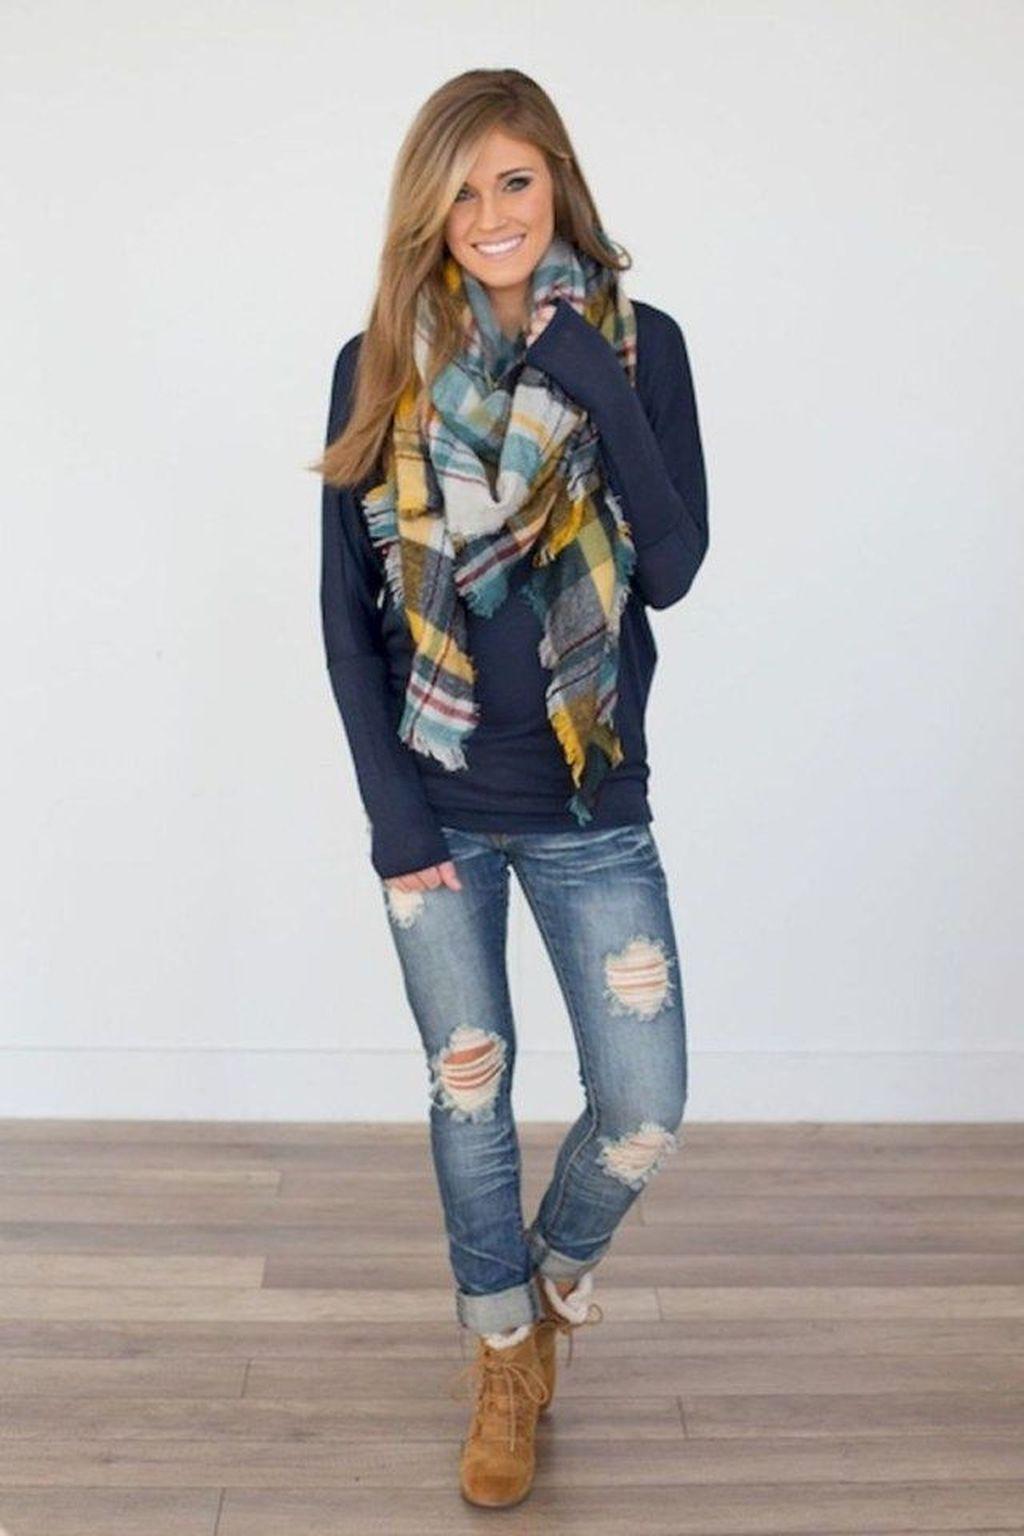 Winter Fashion 2019 Winter Outfits 2019 Women S Fashion Fashion Clothes Women Casual Fall Outfits Casual Fashion